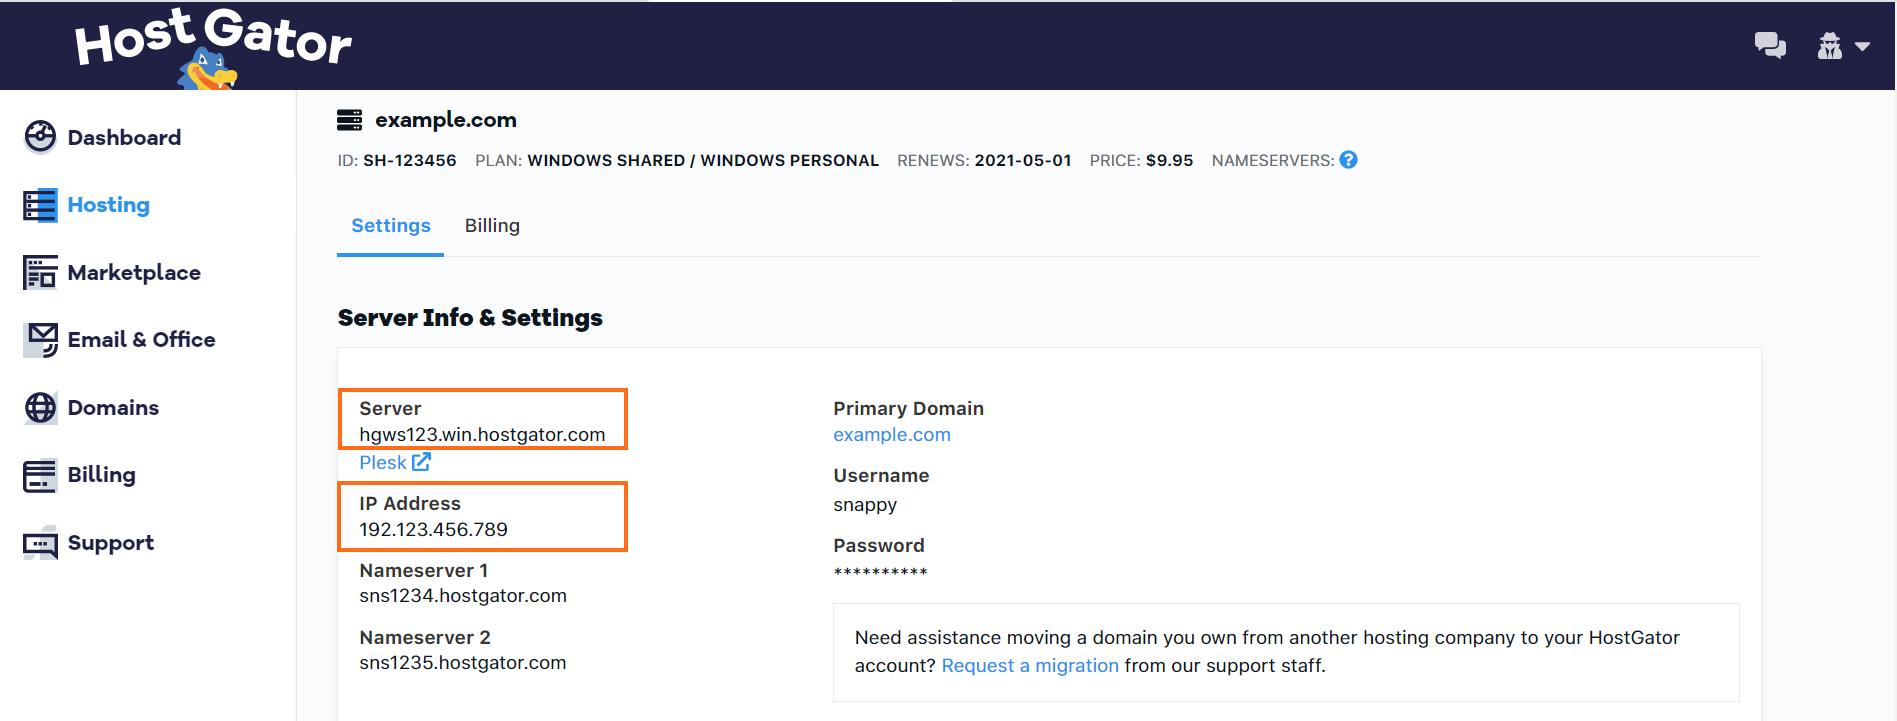 Customer Portal - Windows Hosting - Server Details